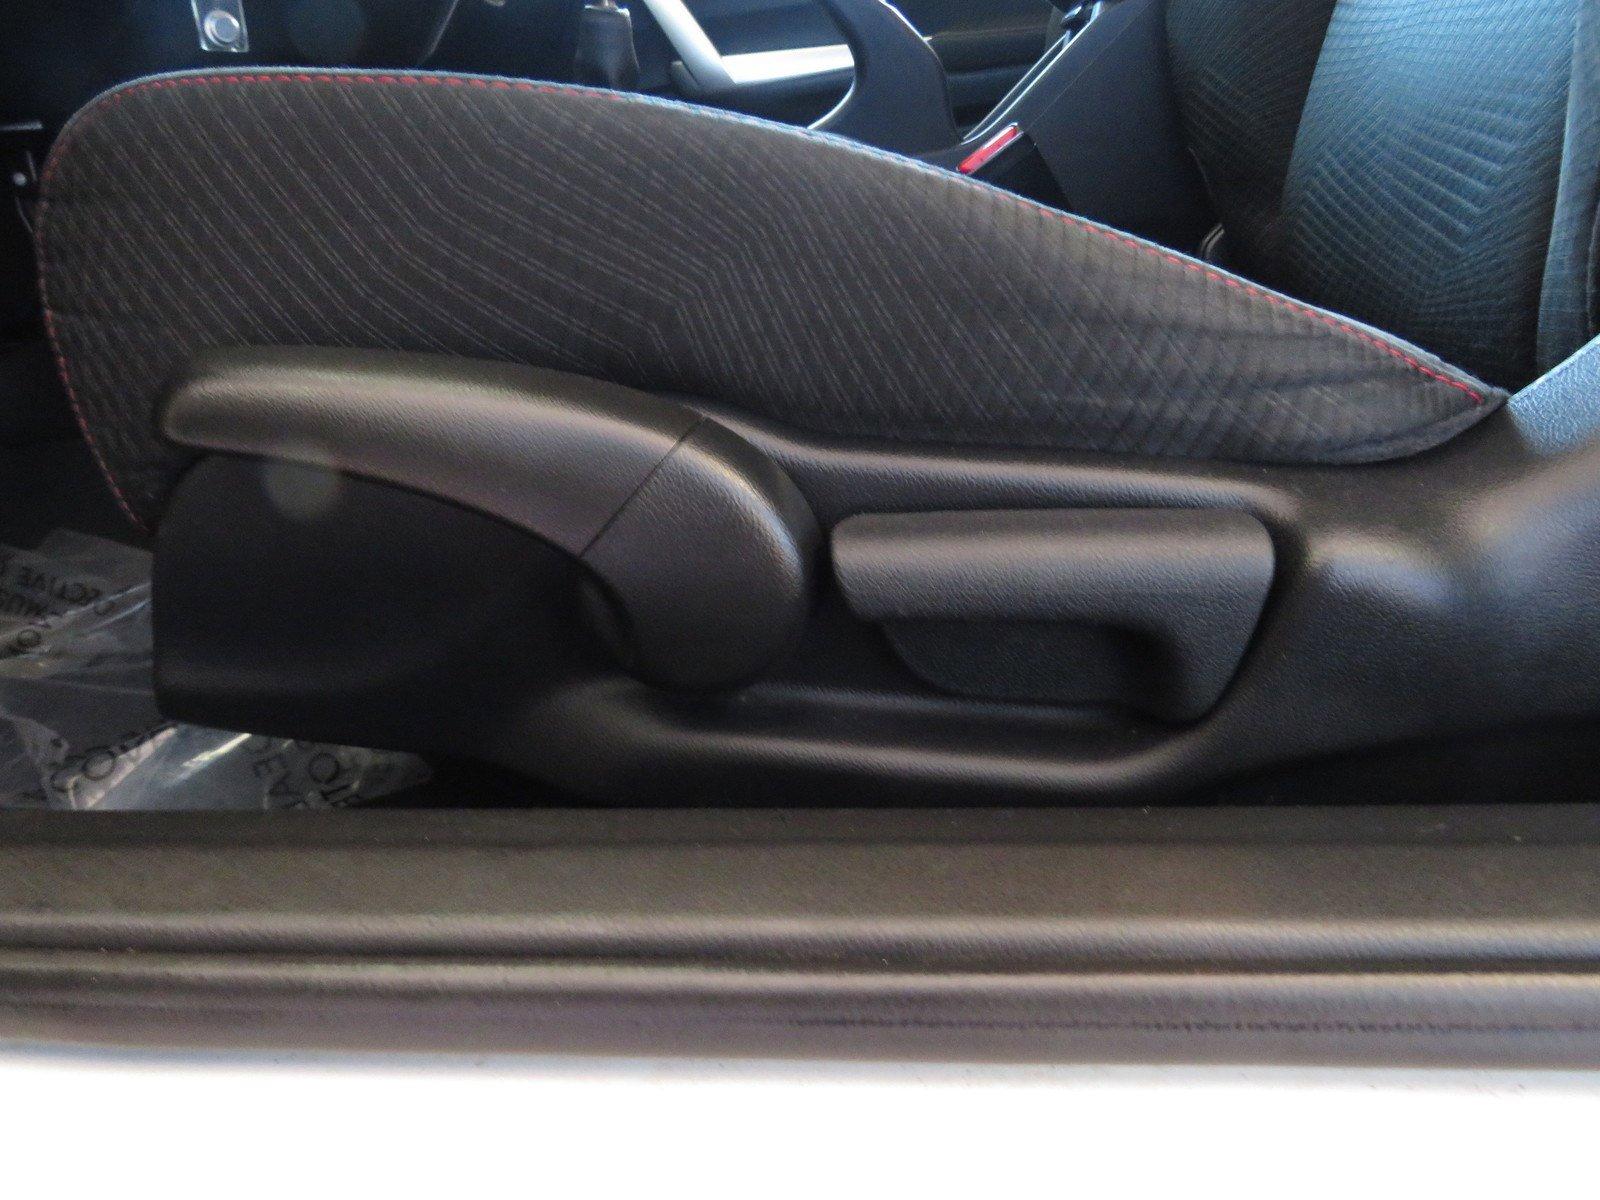 Pre-Owned 2013 Honda Civic Si